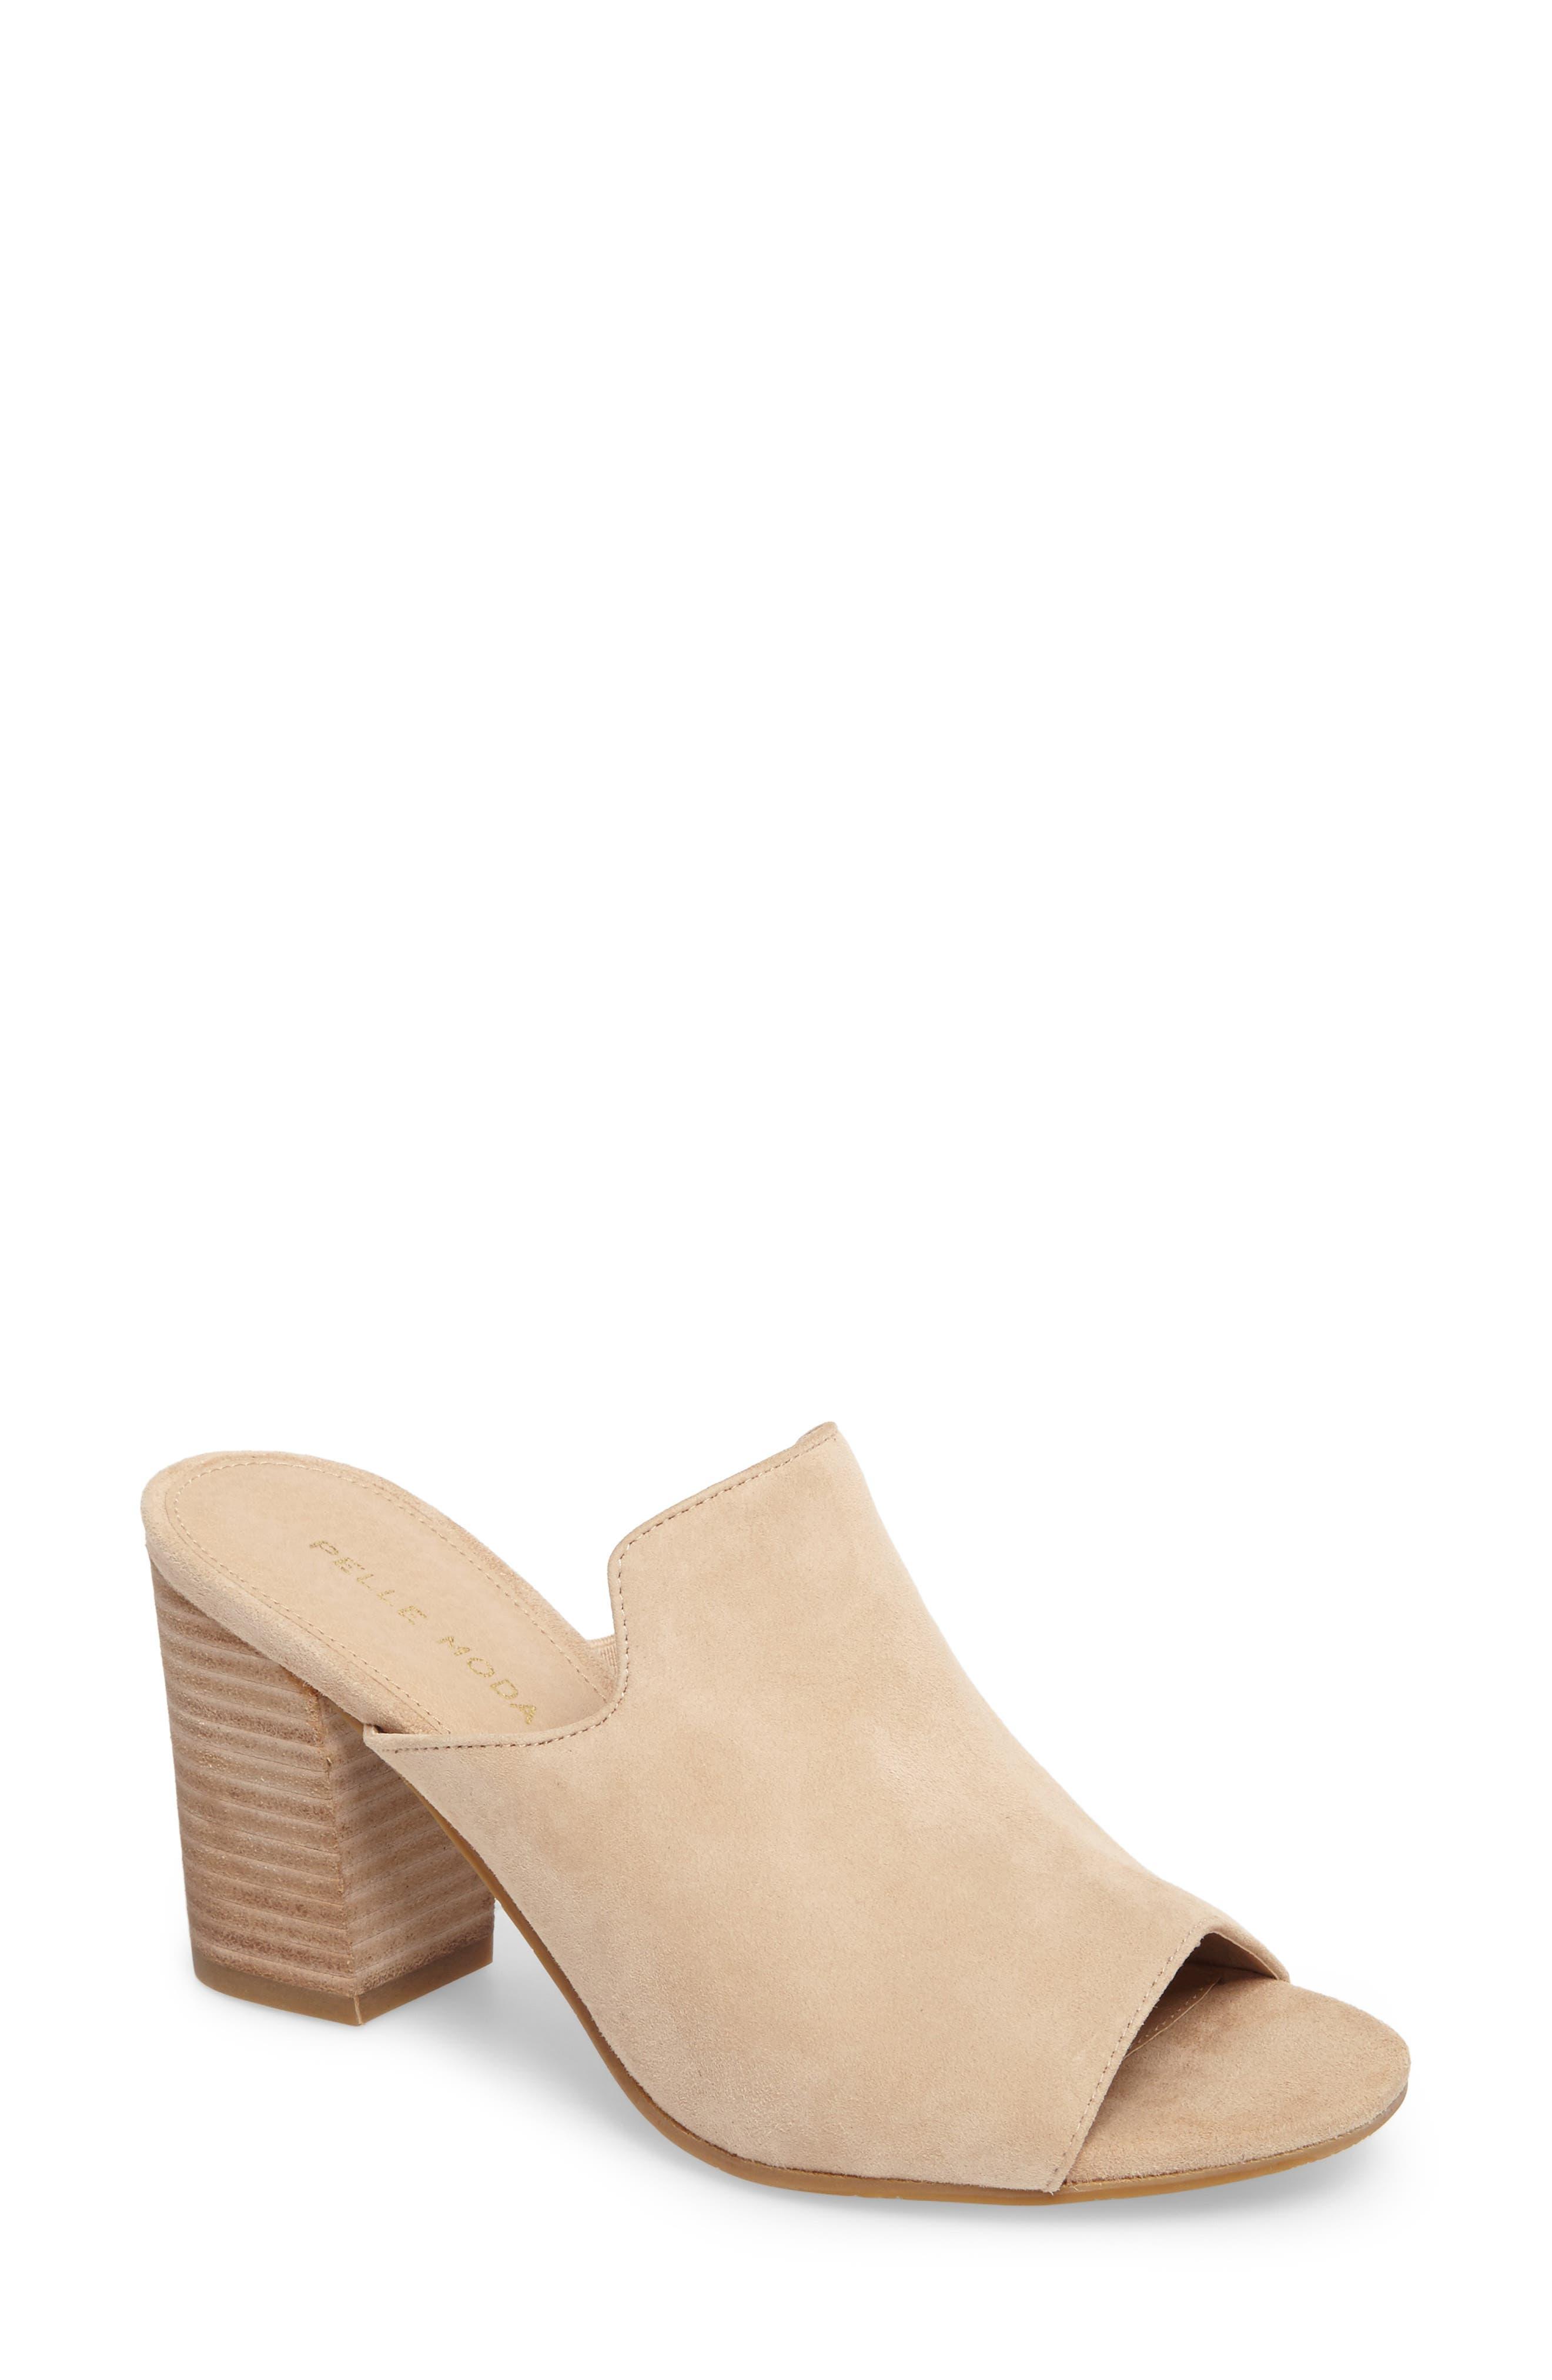 Blair Peep Toe Mule,                         Main,                         color, Sand Leather